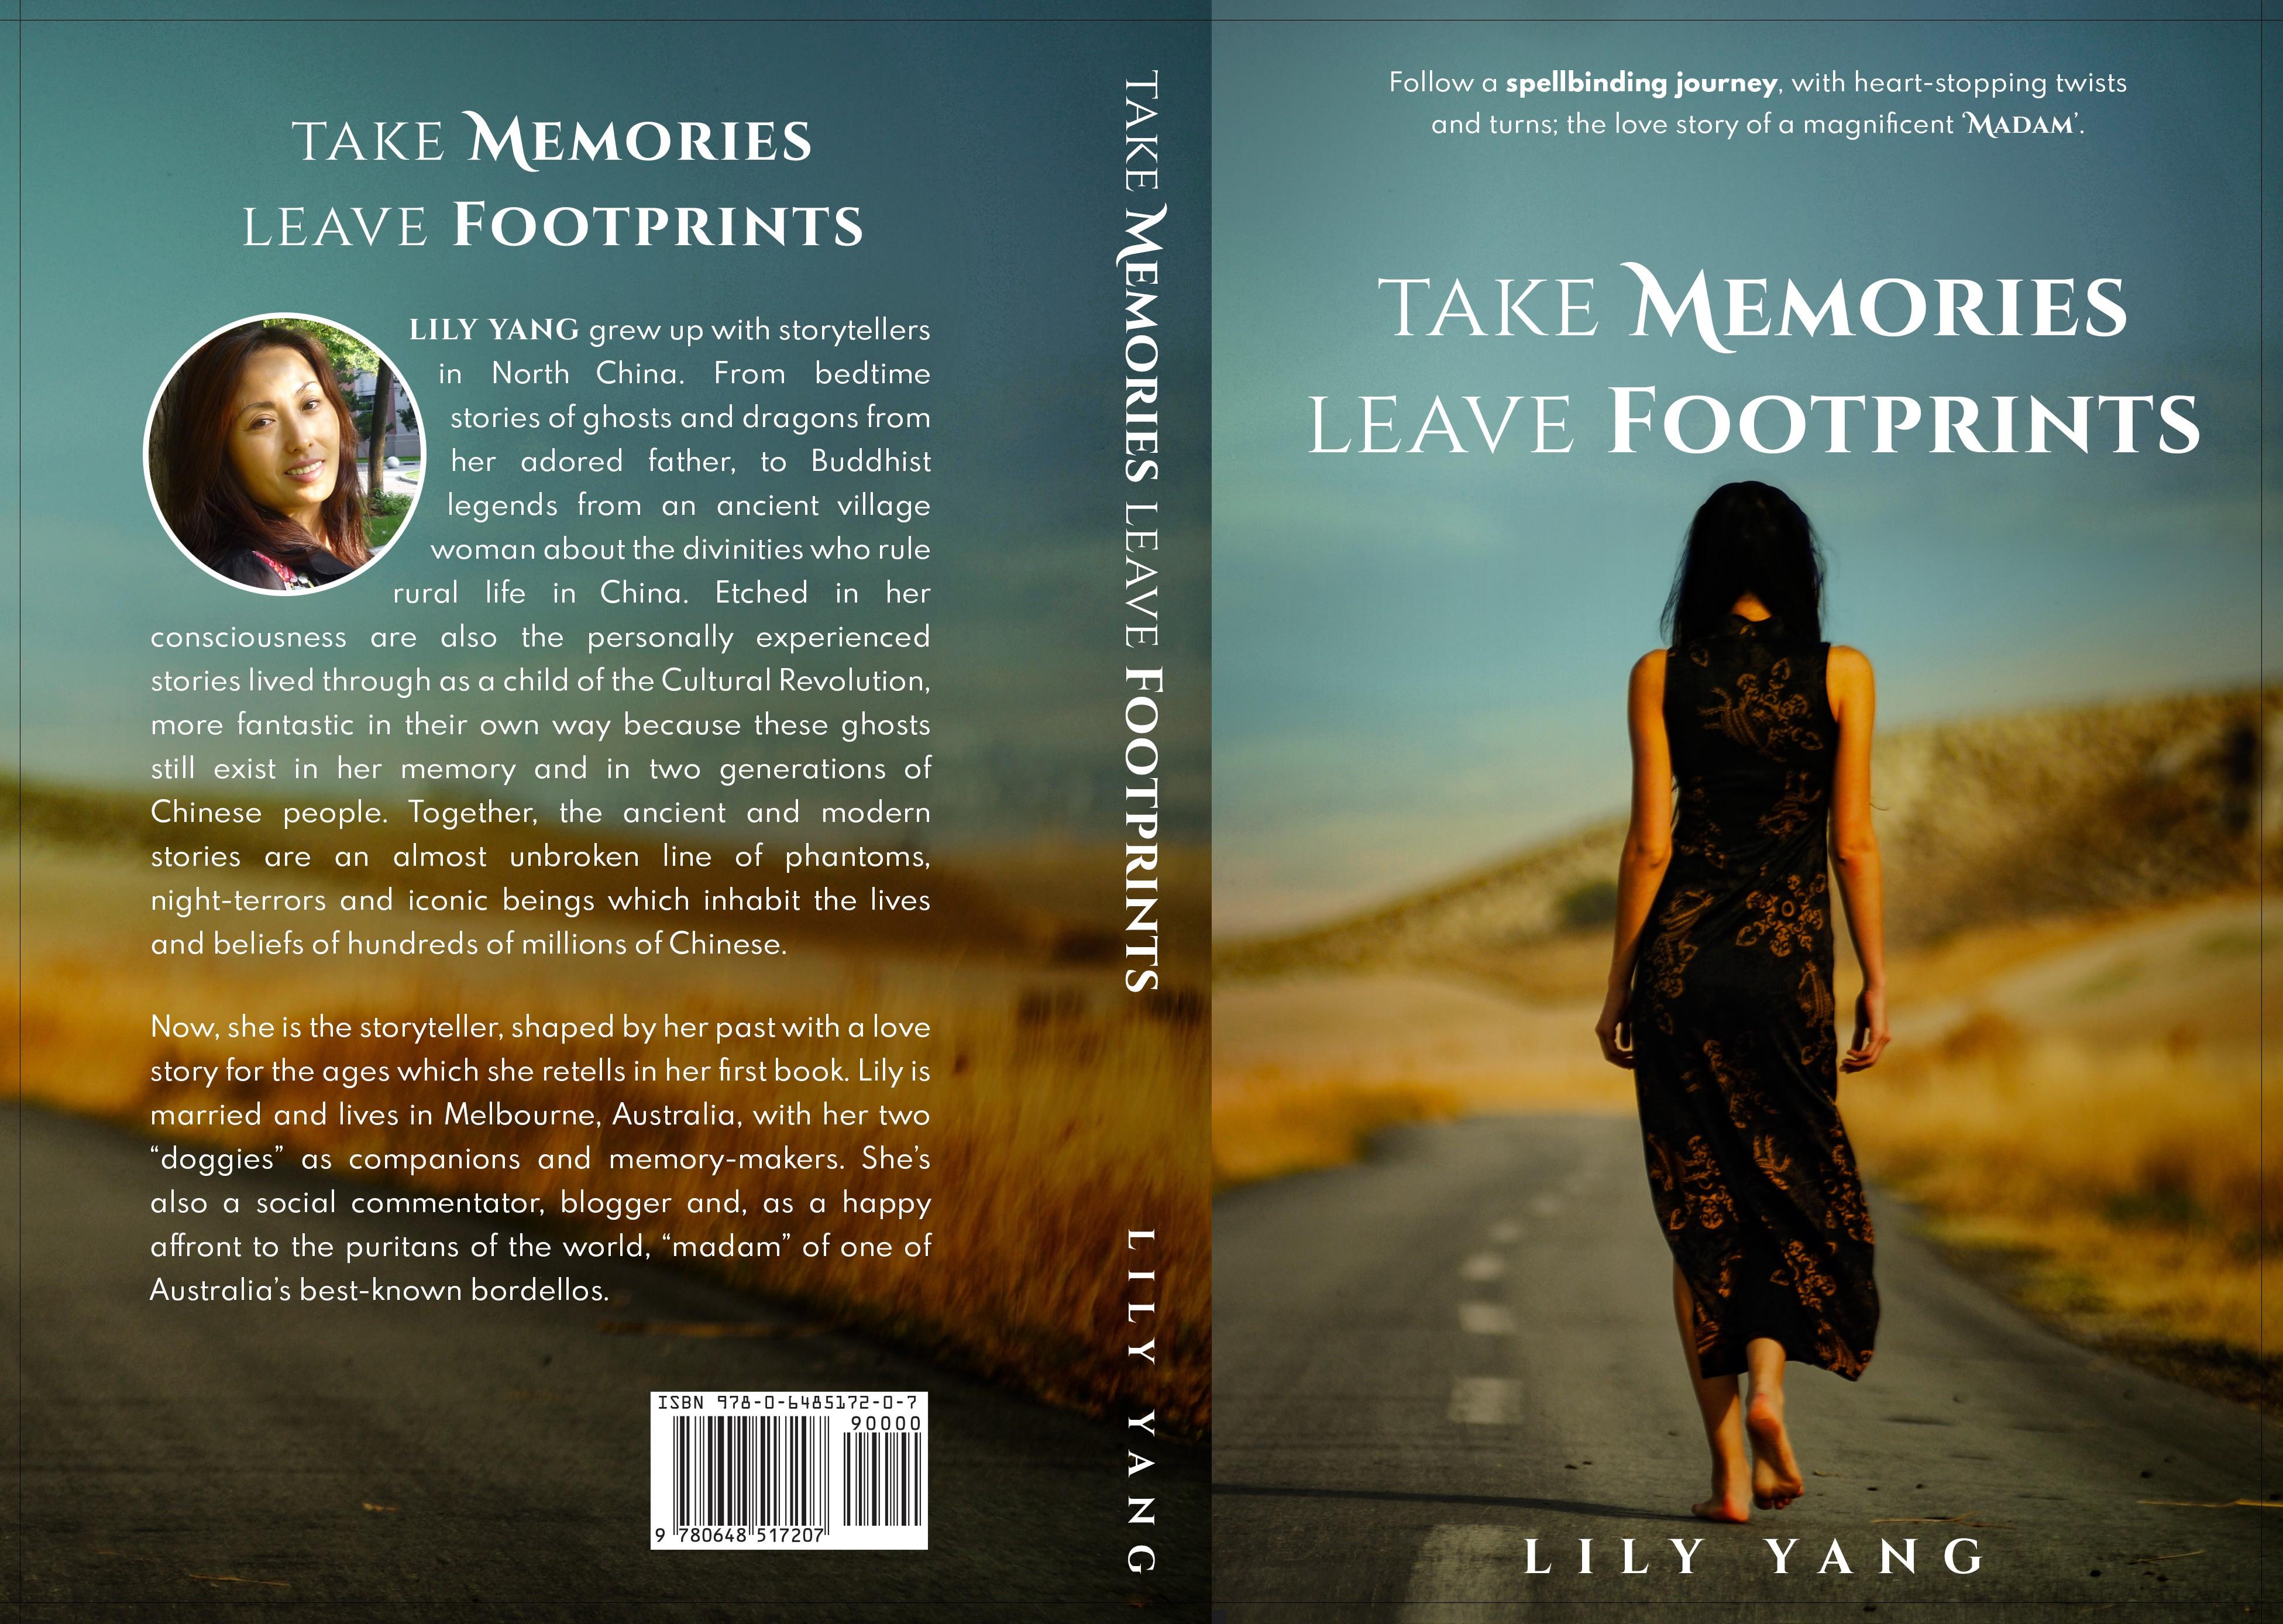 """Take Memories Leave Footprints"" Layout Re-Design"